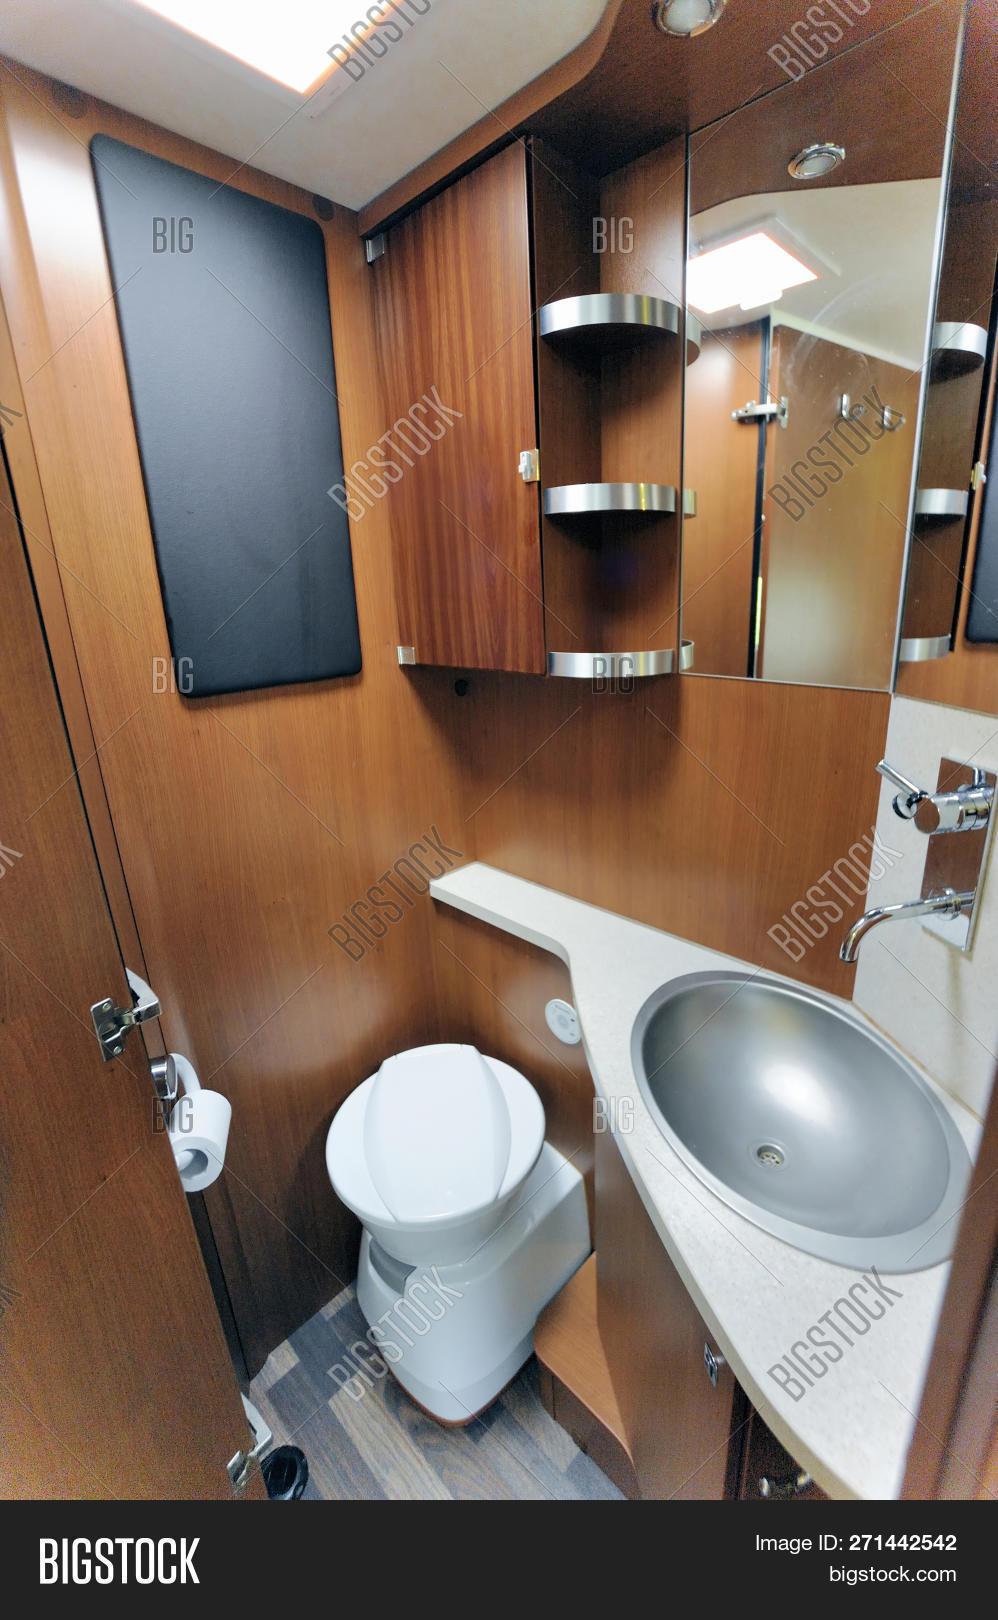 inside rv washroom image photo free